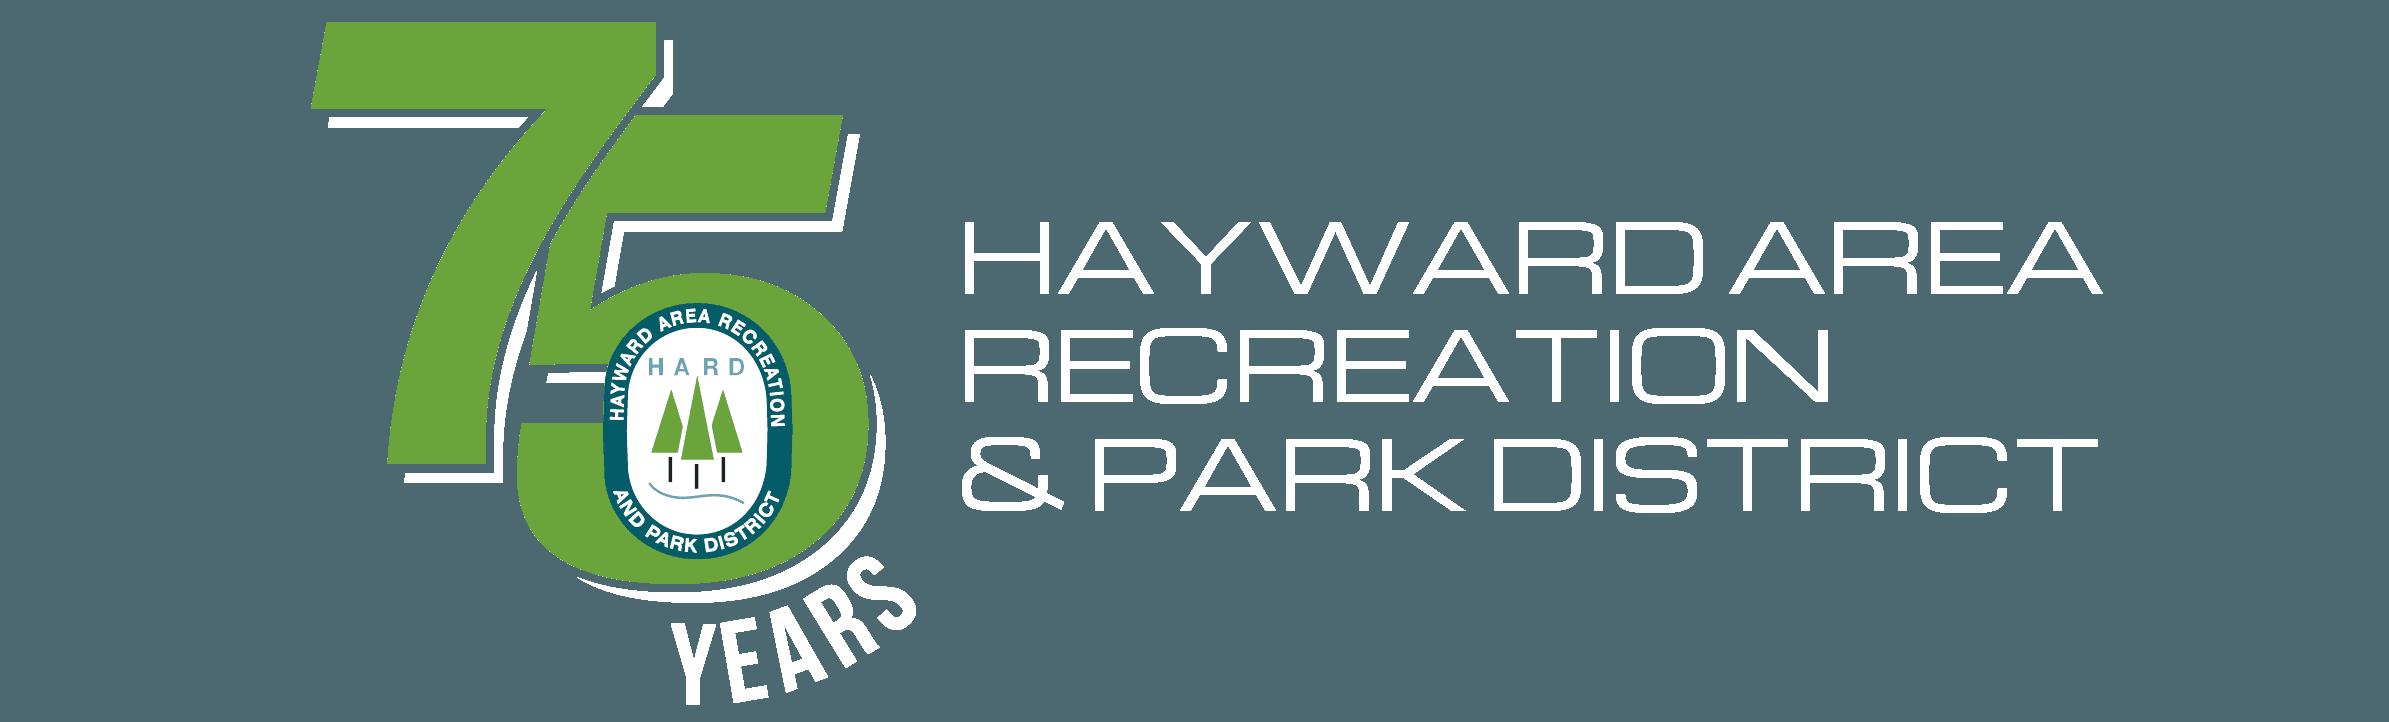 Bid Results | Hayward Area Recreation and Park District, CA